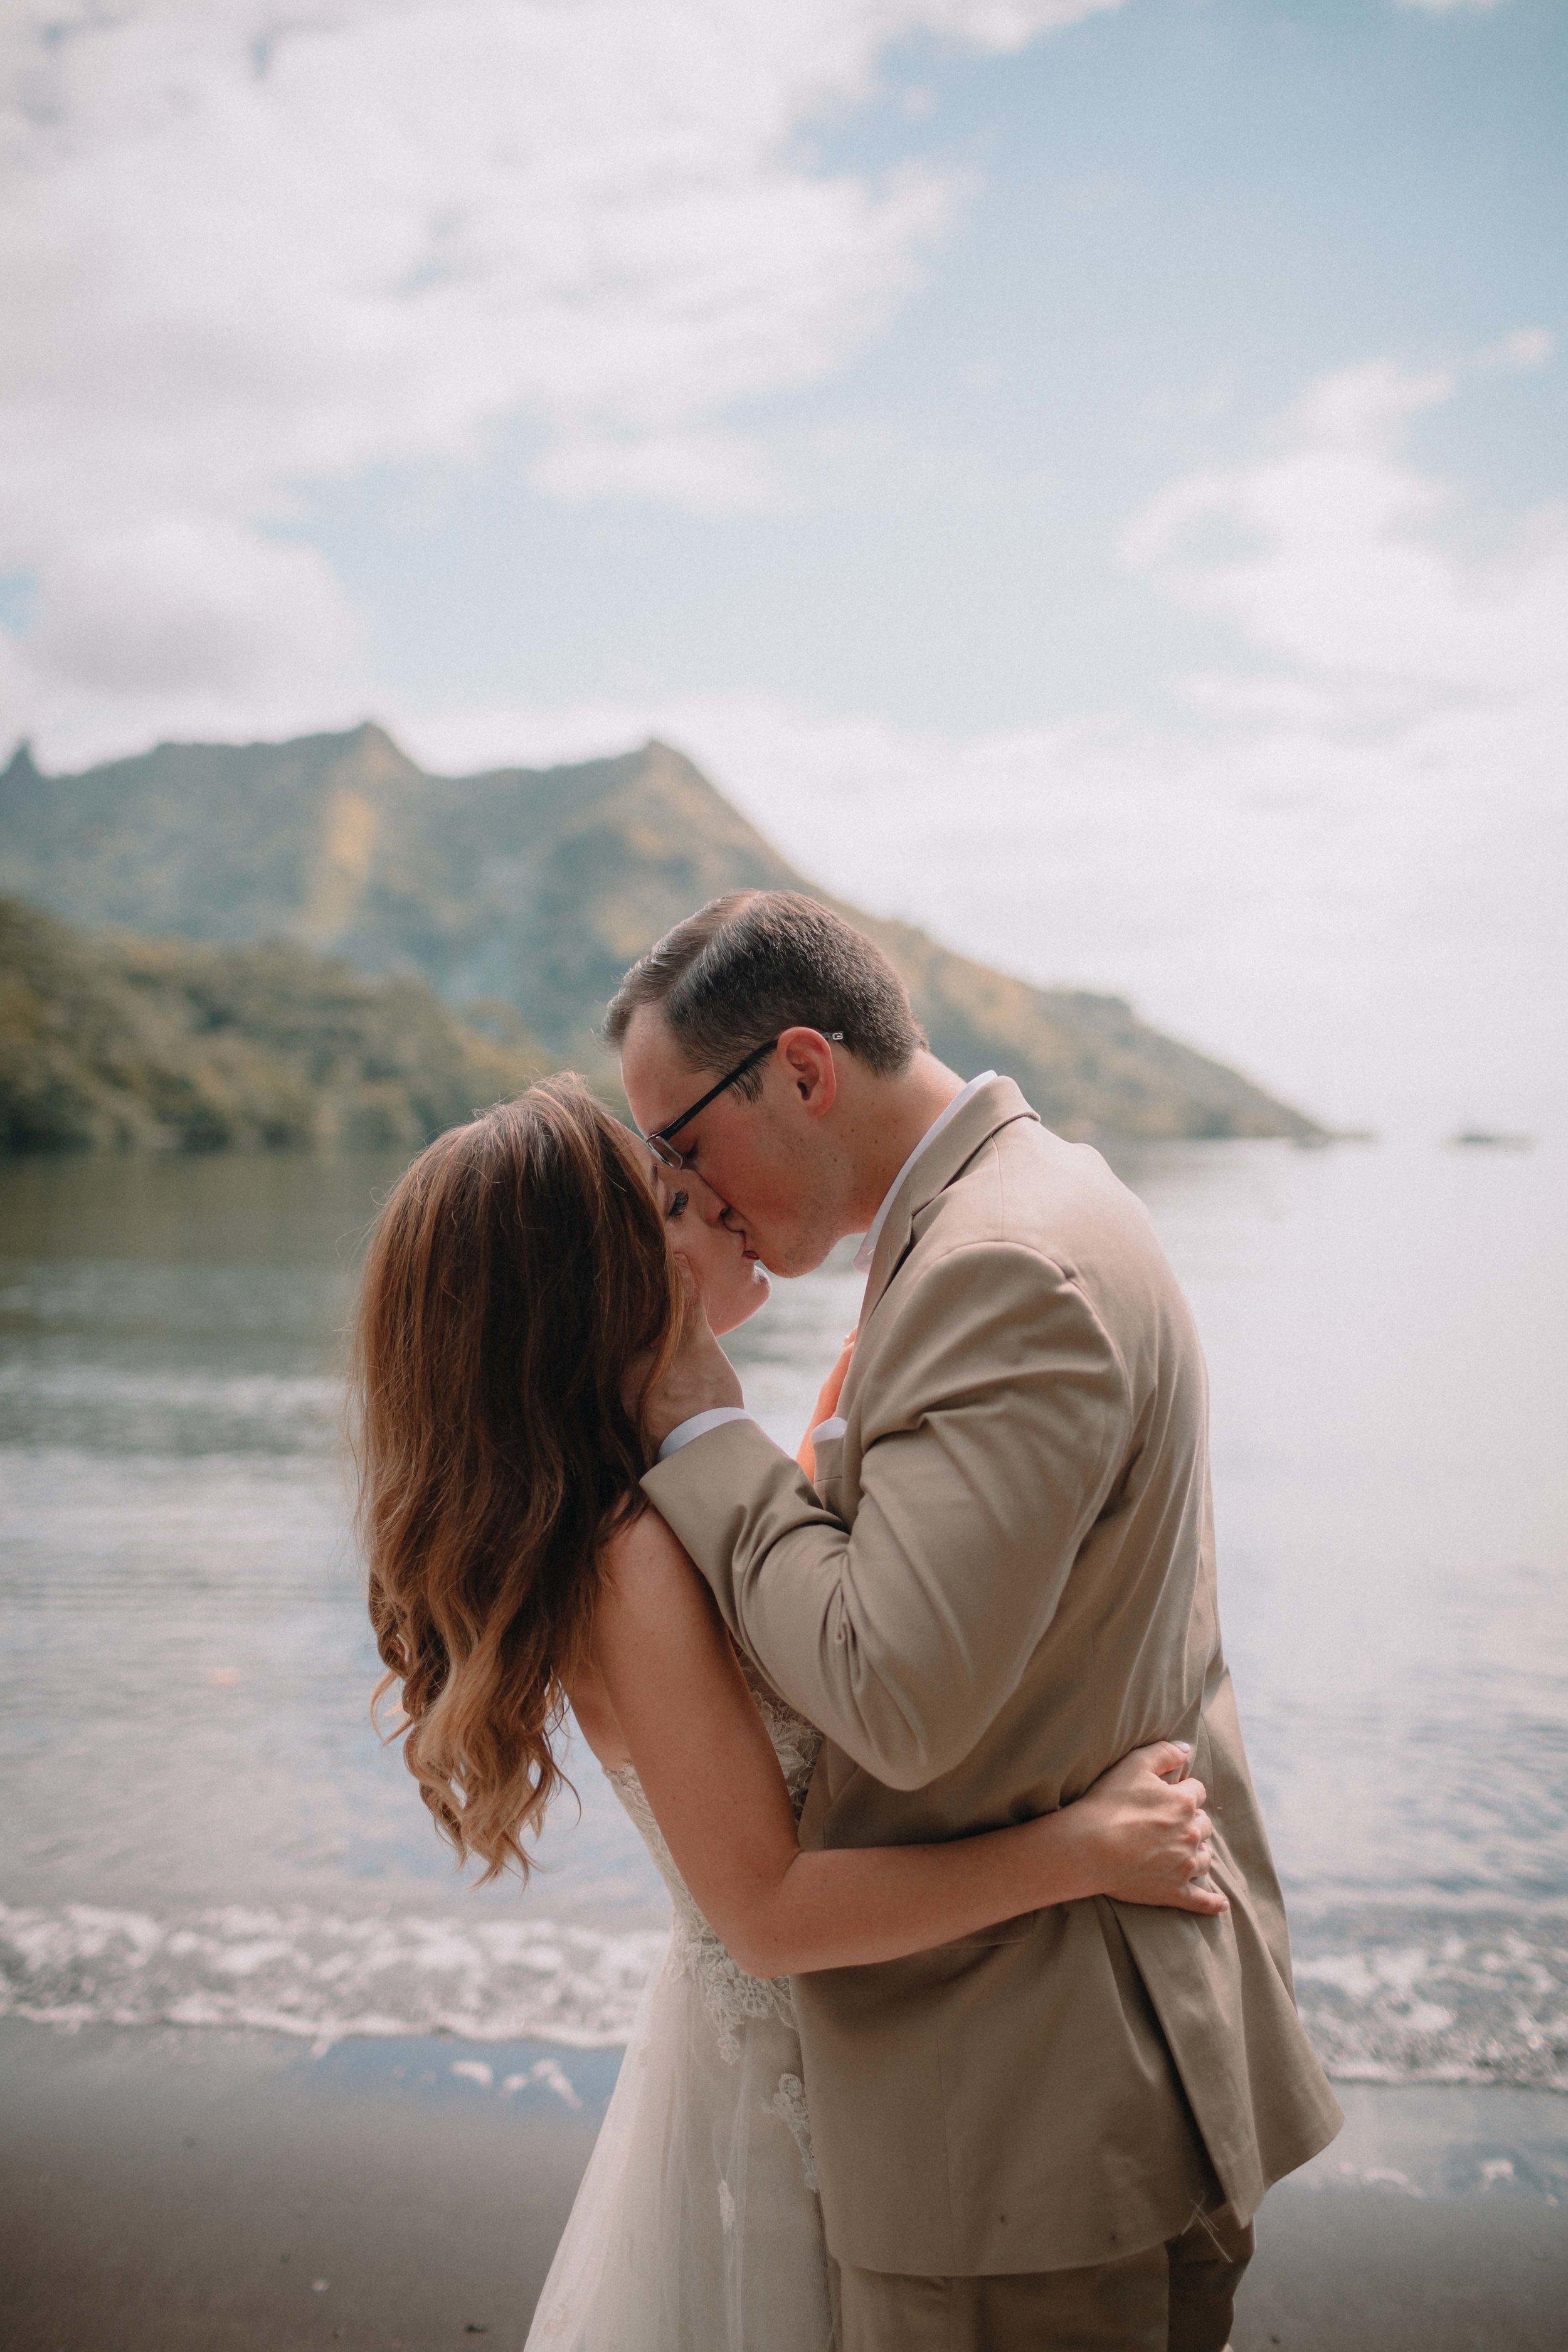 JonathanBurkhart_Moorea_Wedding_Oklahoma_7Q6A5362.jpg